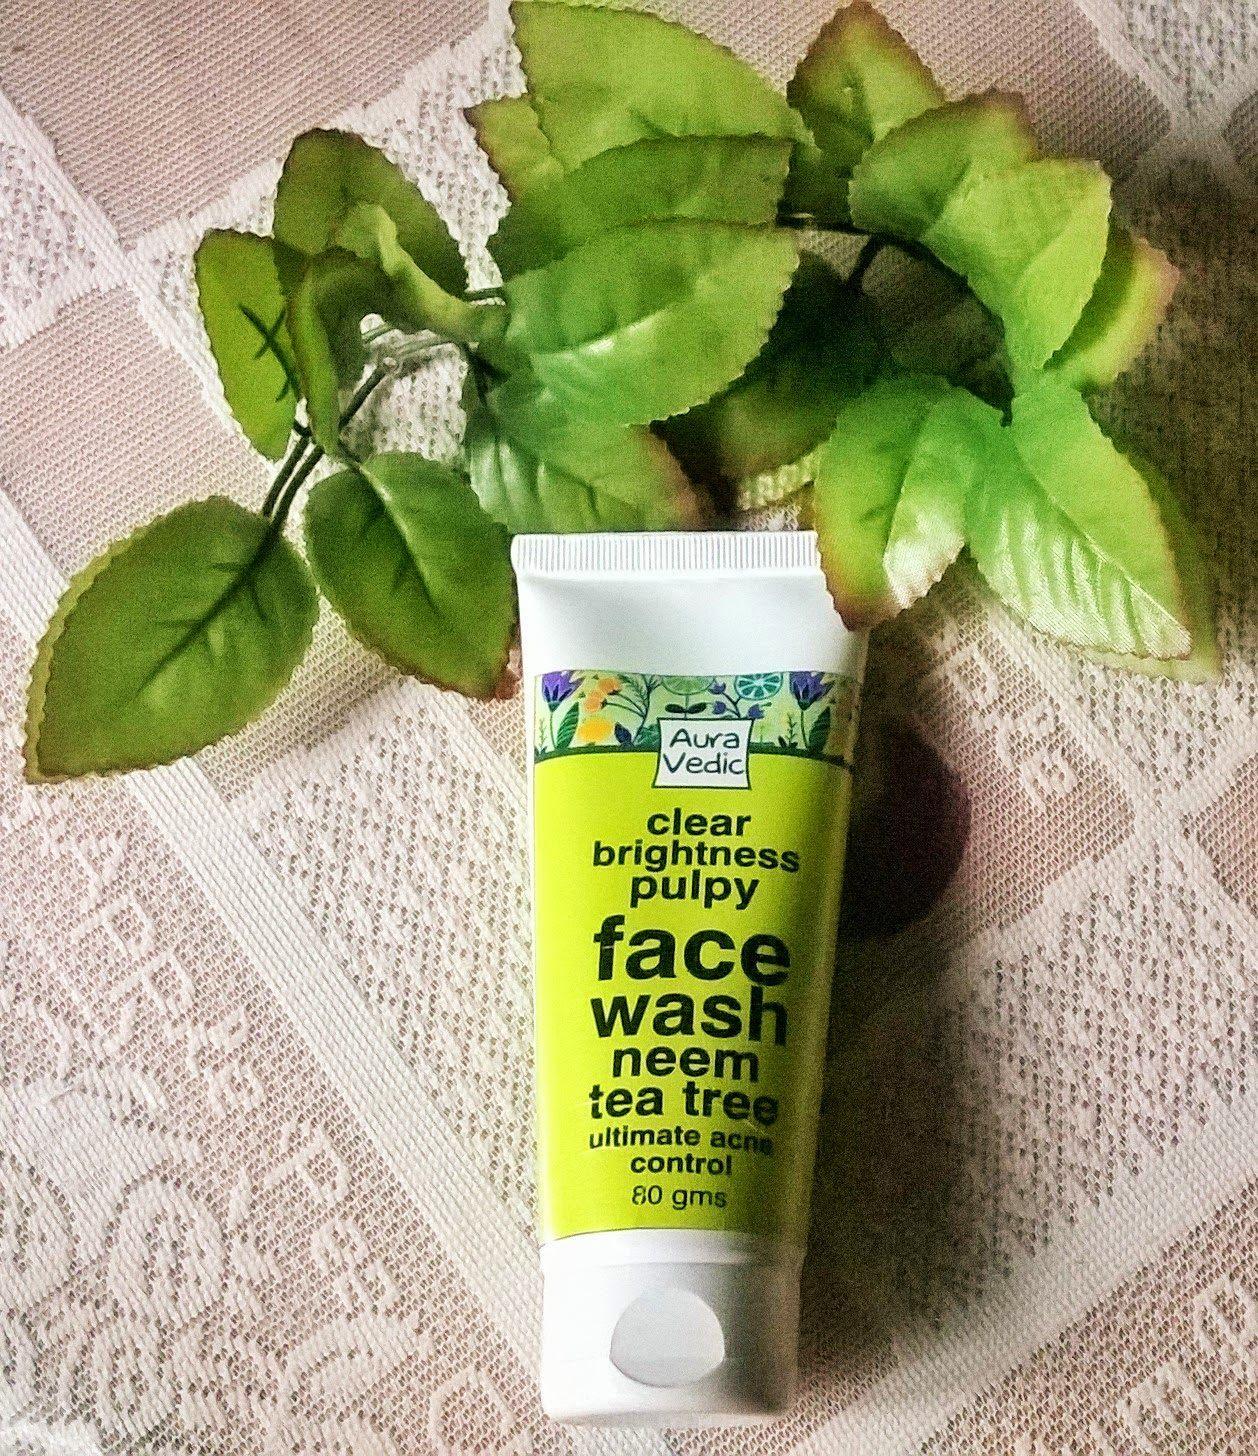 Beauty & Beyond: Auravedic Clear Brightness Pulpy Facewash Review